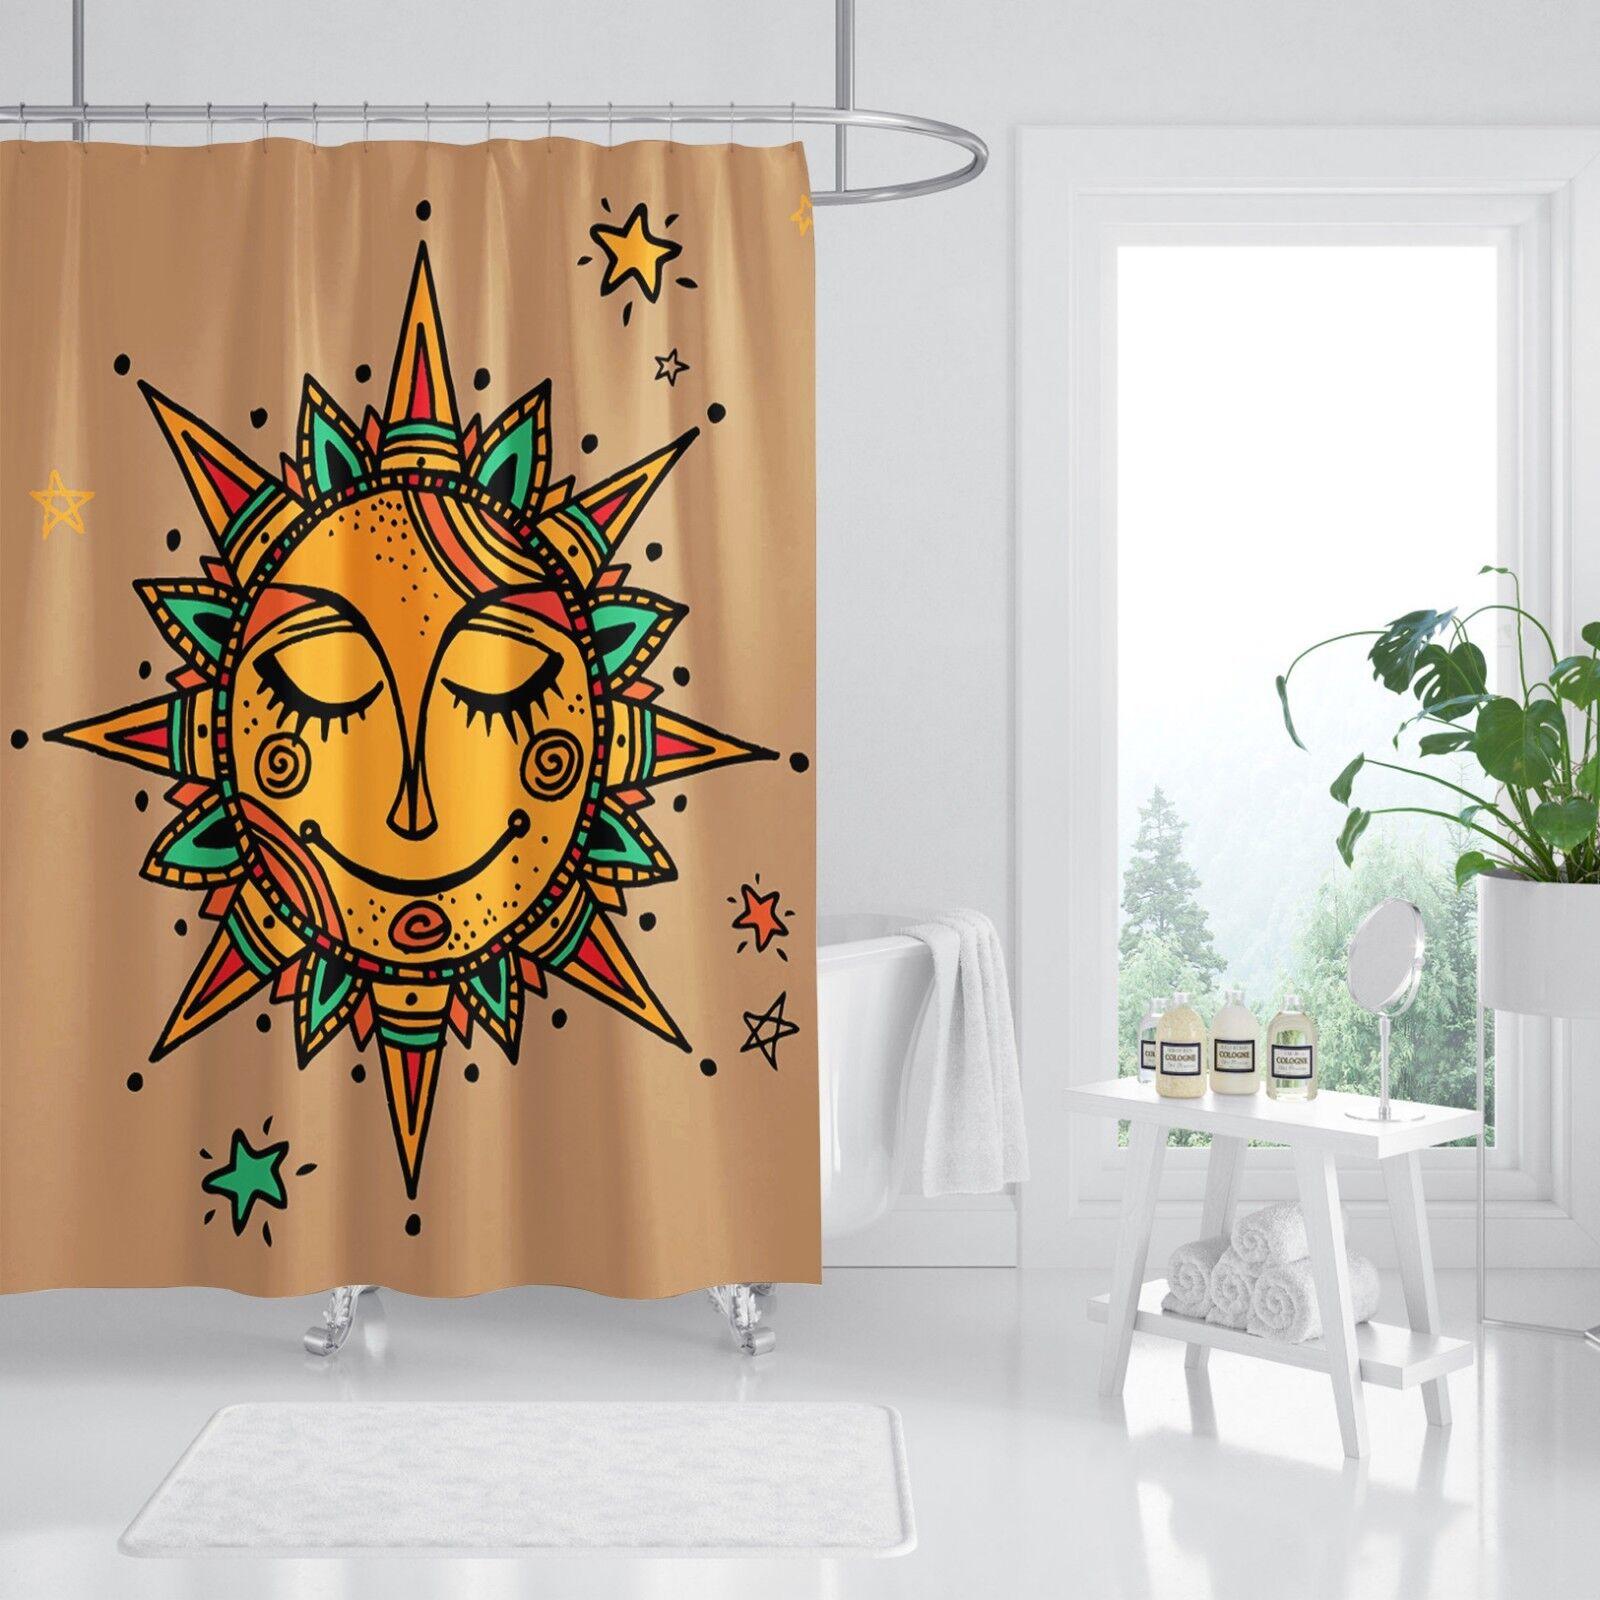 3D Sun Pattern 564 Shower Curtain Waterproof Fiber Bathroom Home Windows Toilet